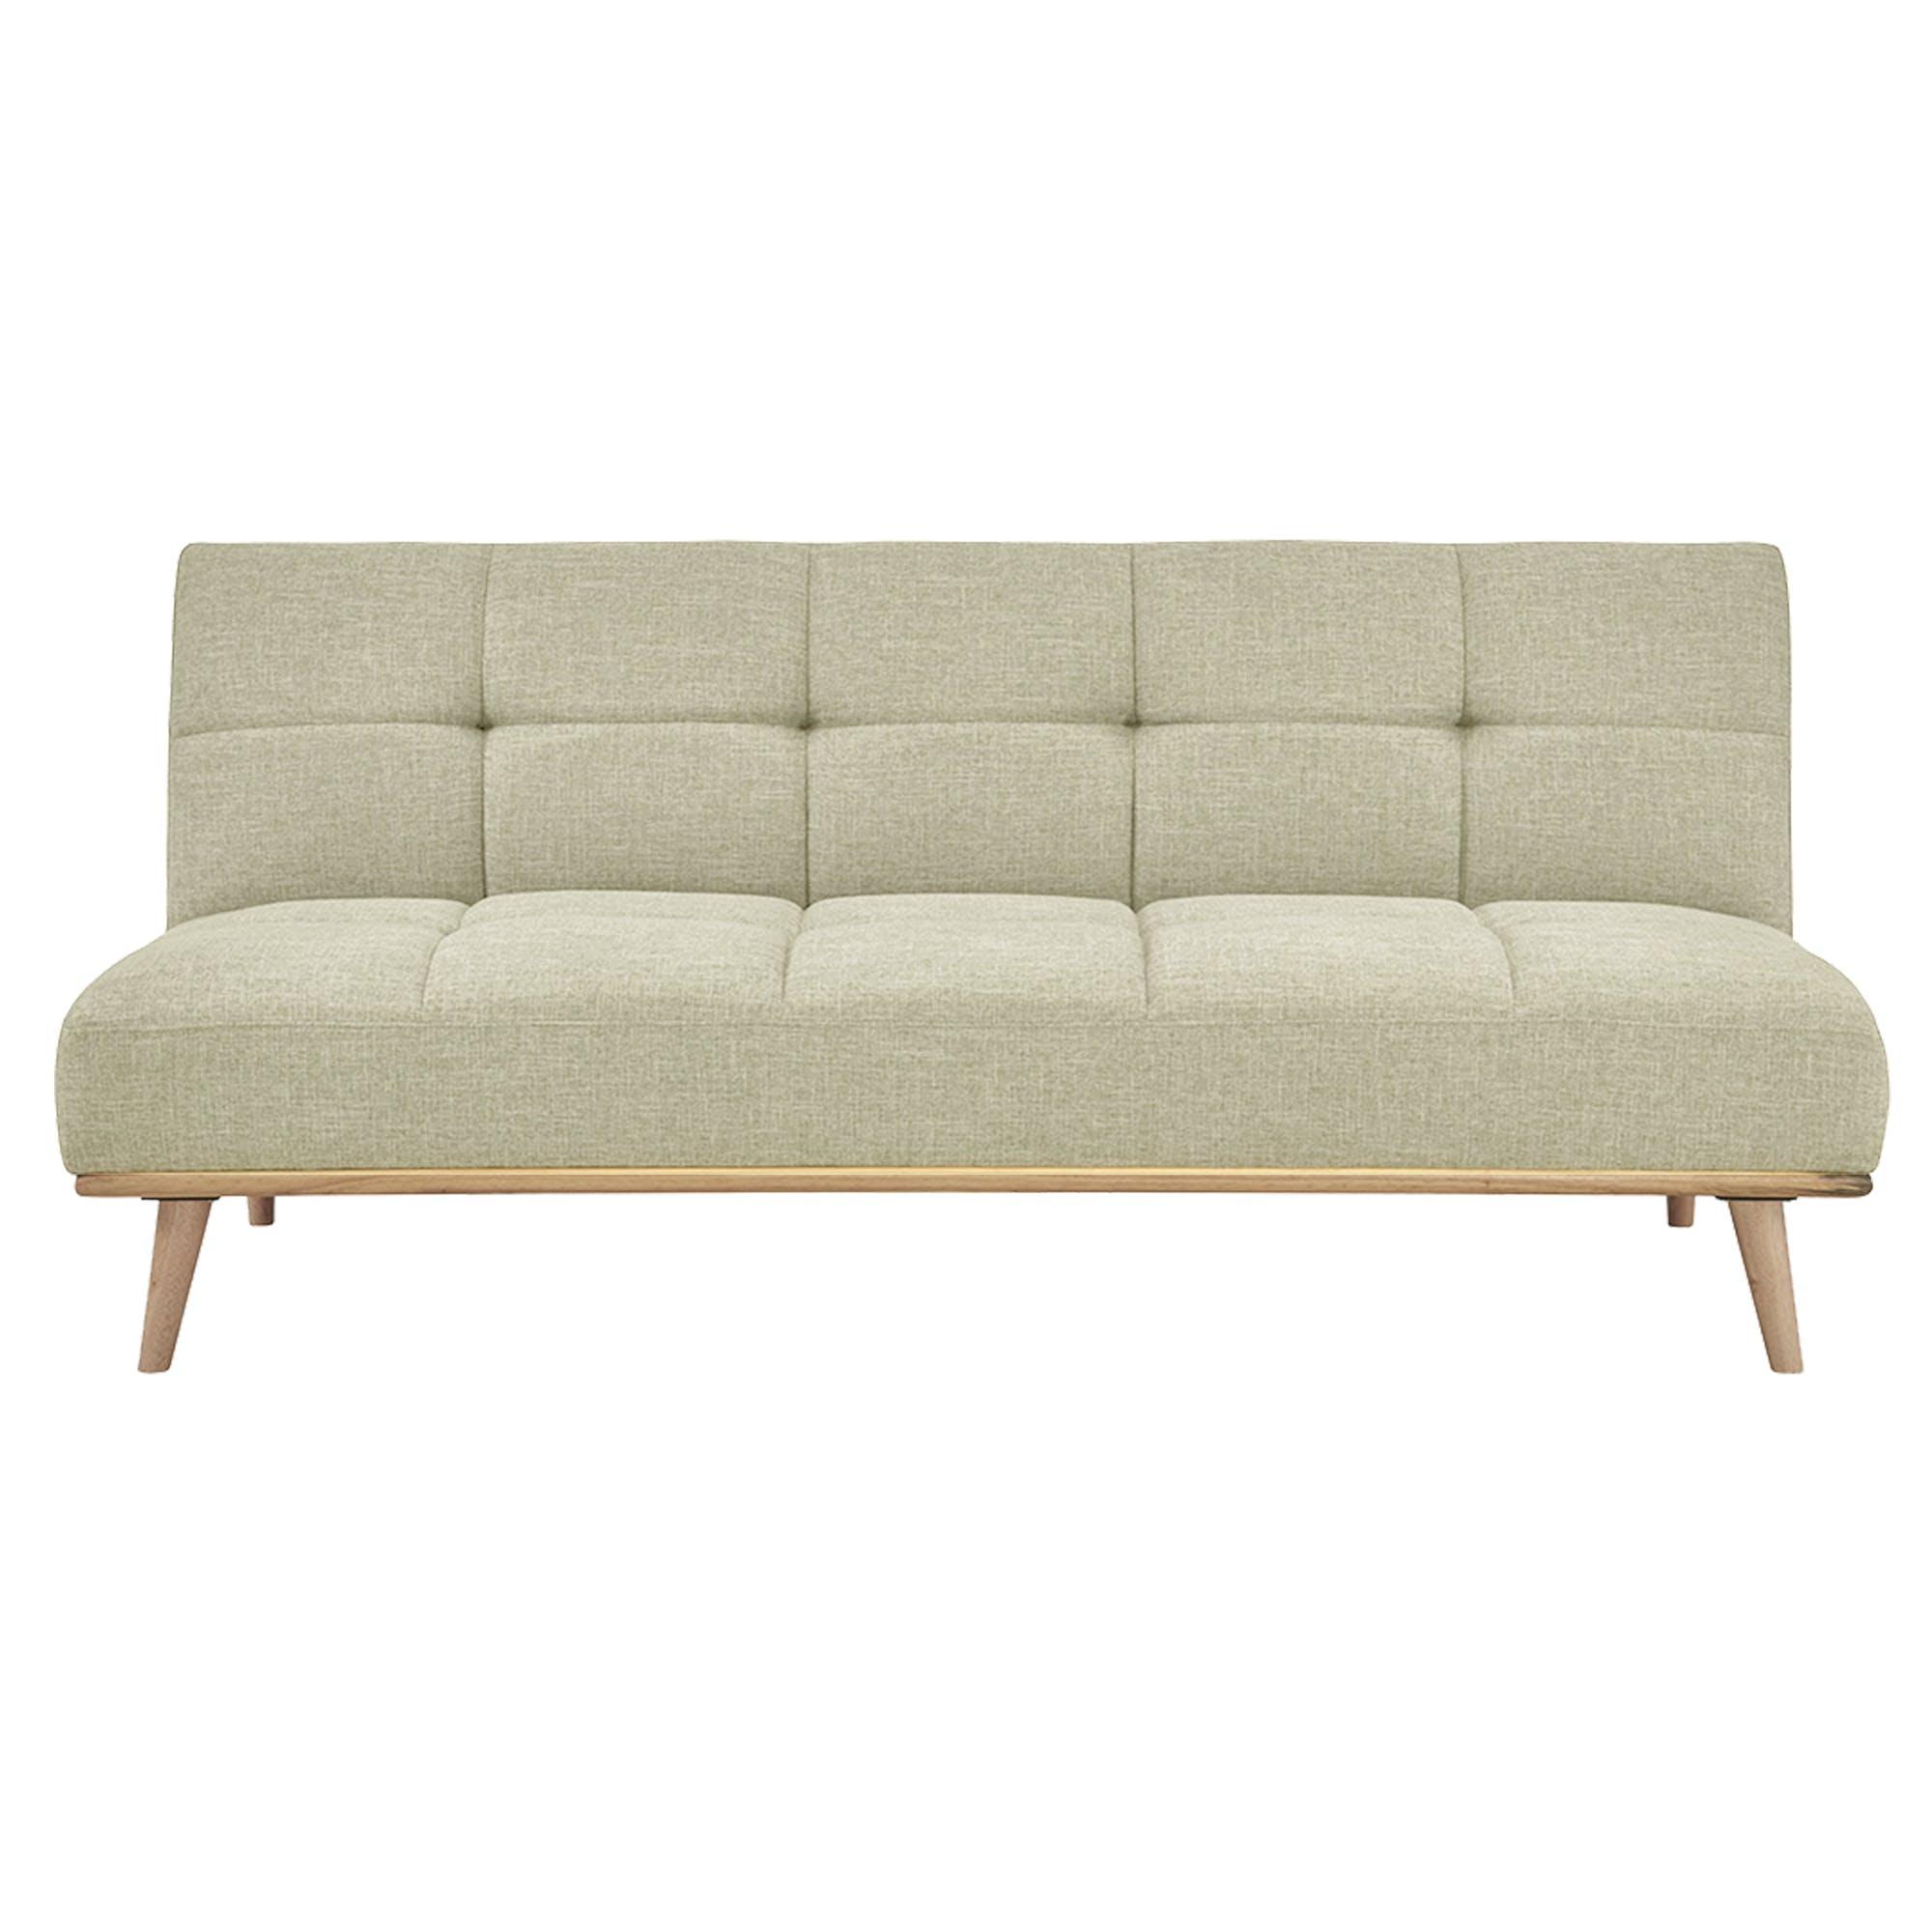 HipVan Kori Sofa Bed